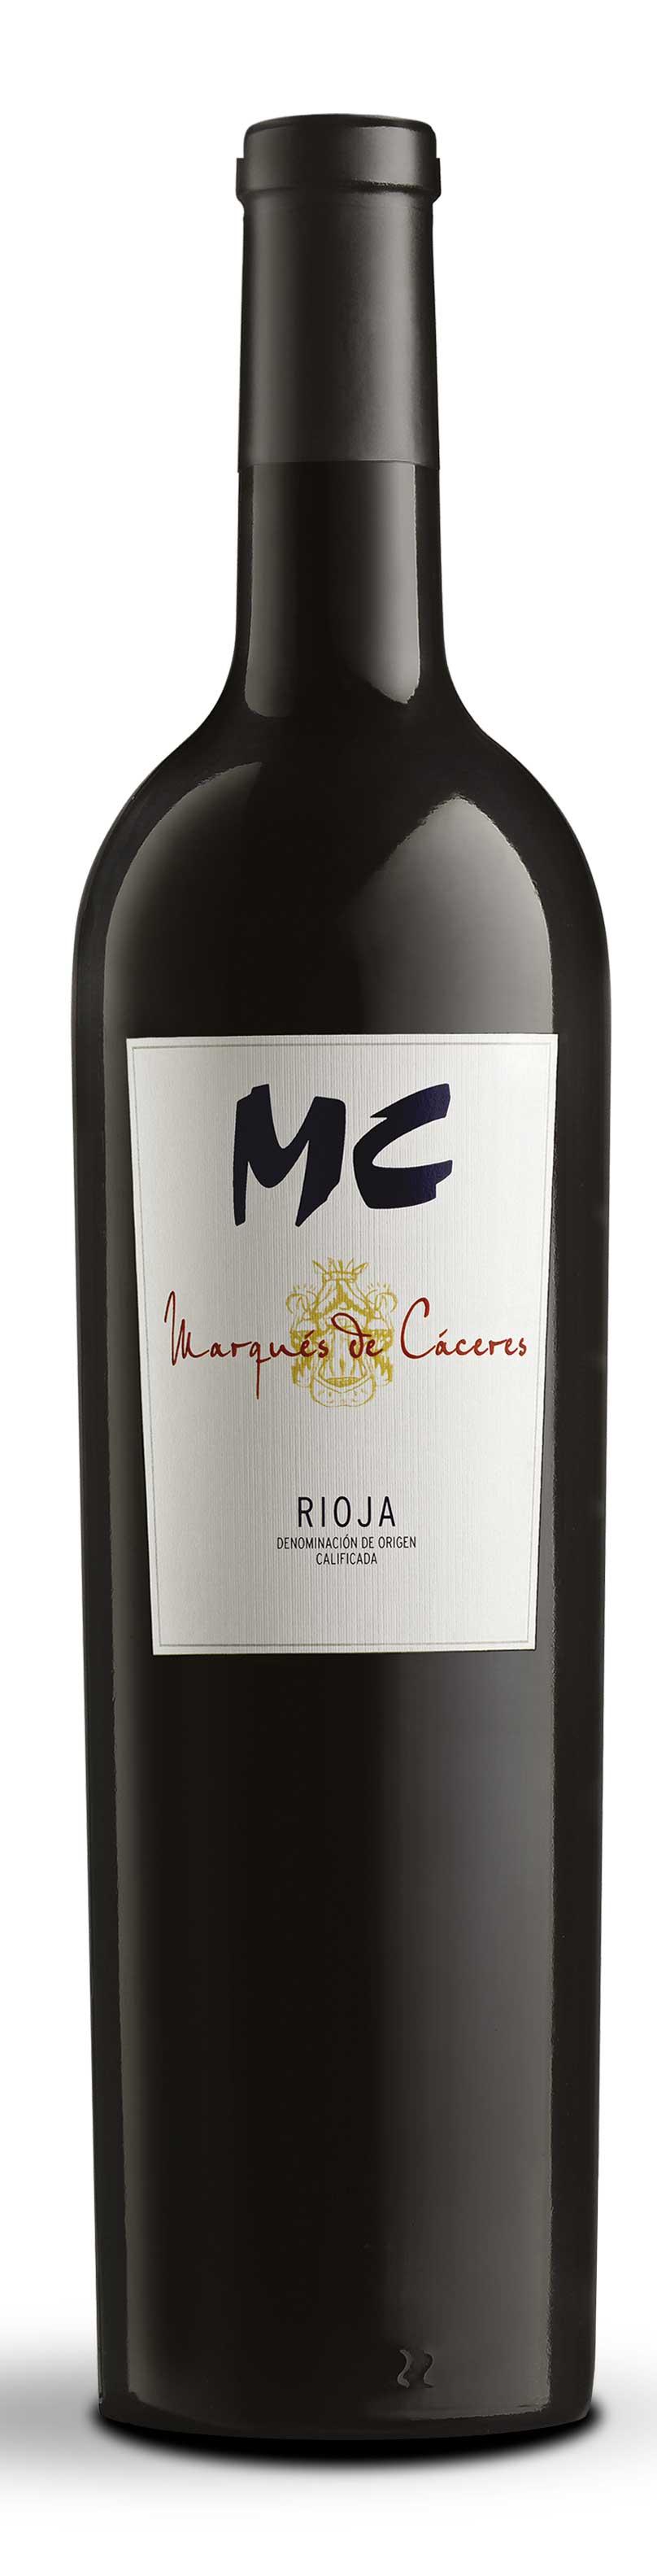 MC ( Bodegas Marqués de Cáceres ) 2013